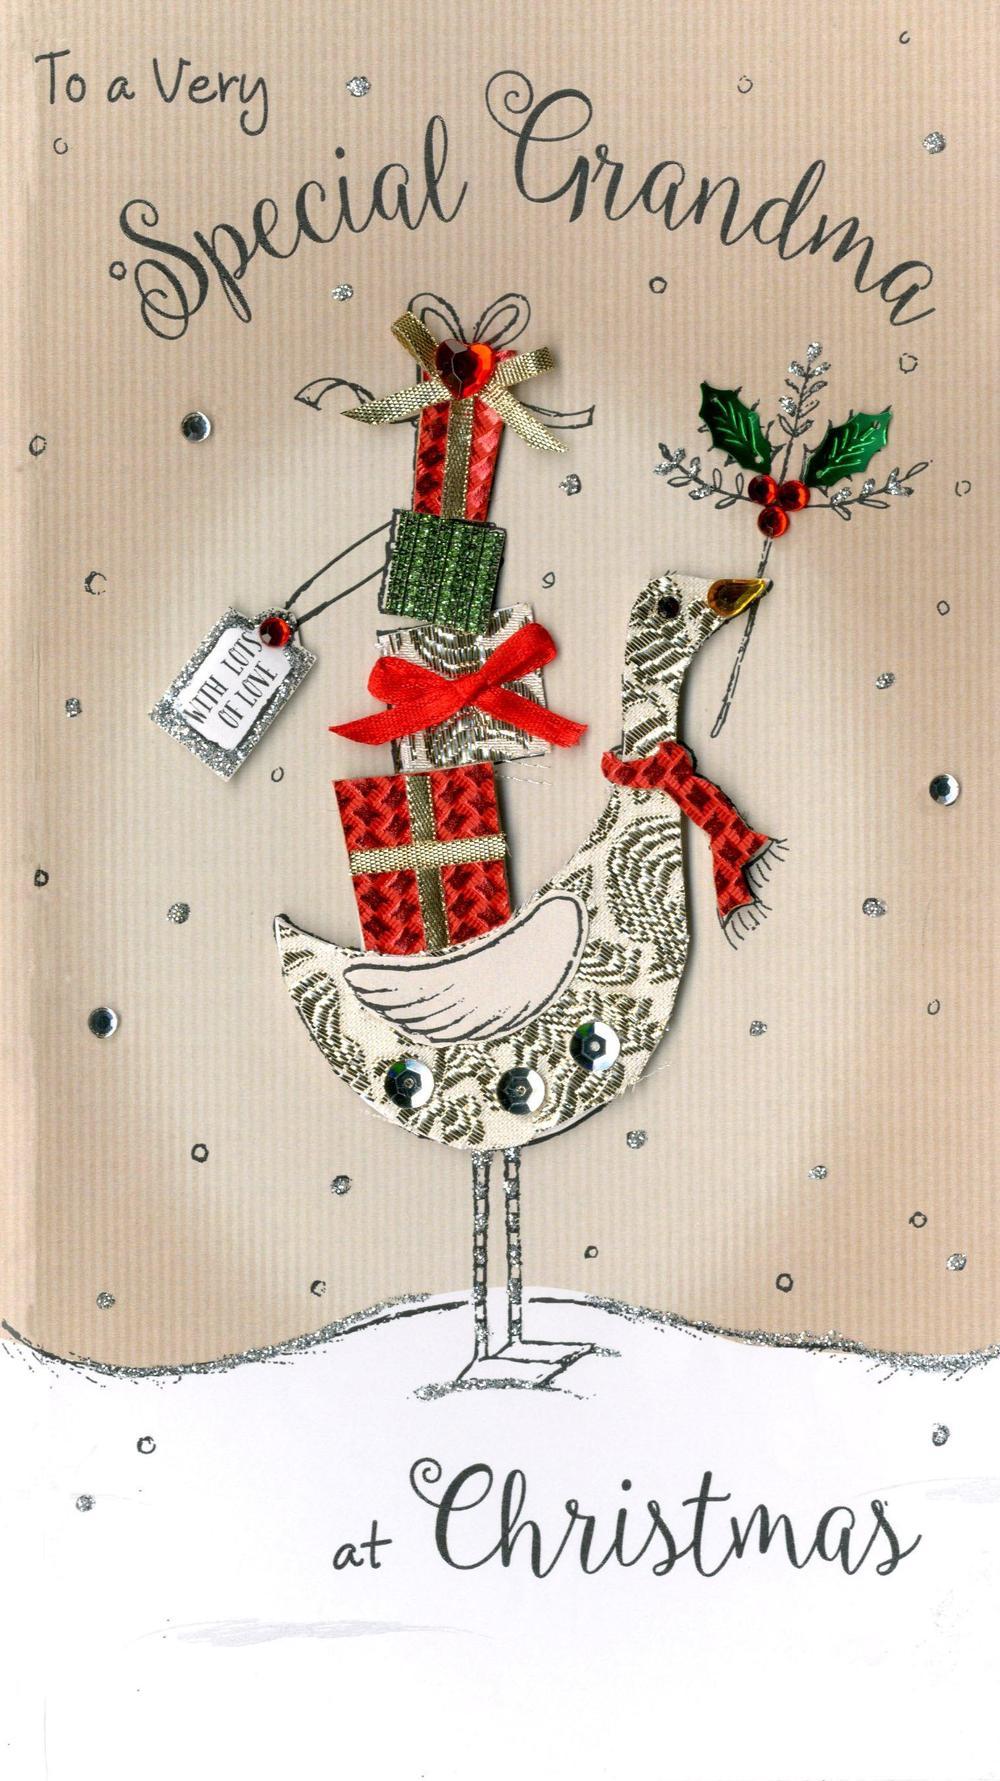 Special Grandma Embellished Christmas Card